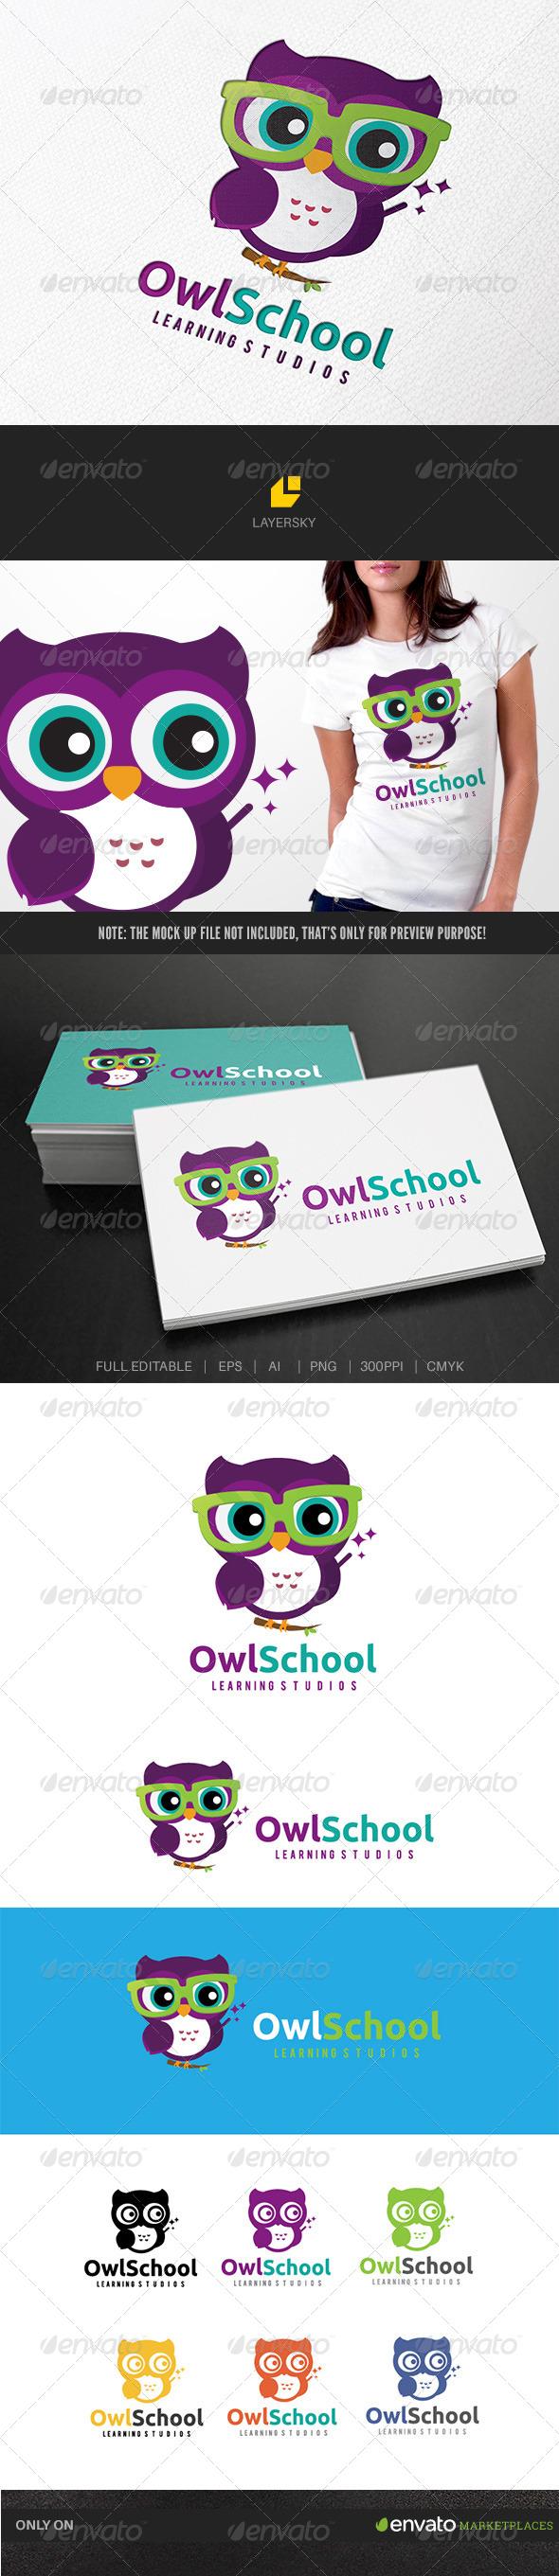 GraphicRiver Owl School 7865427